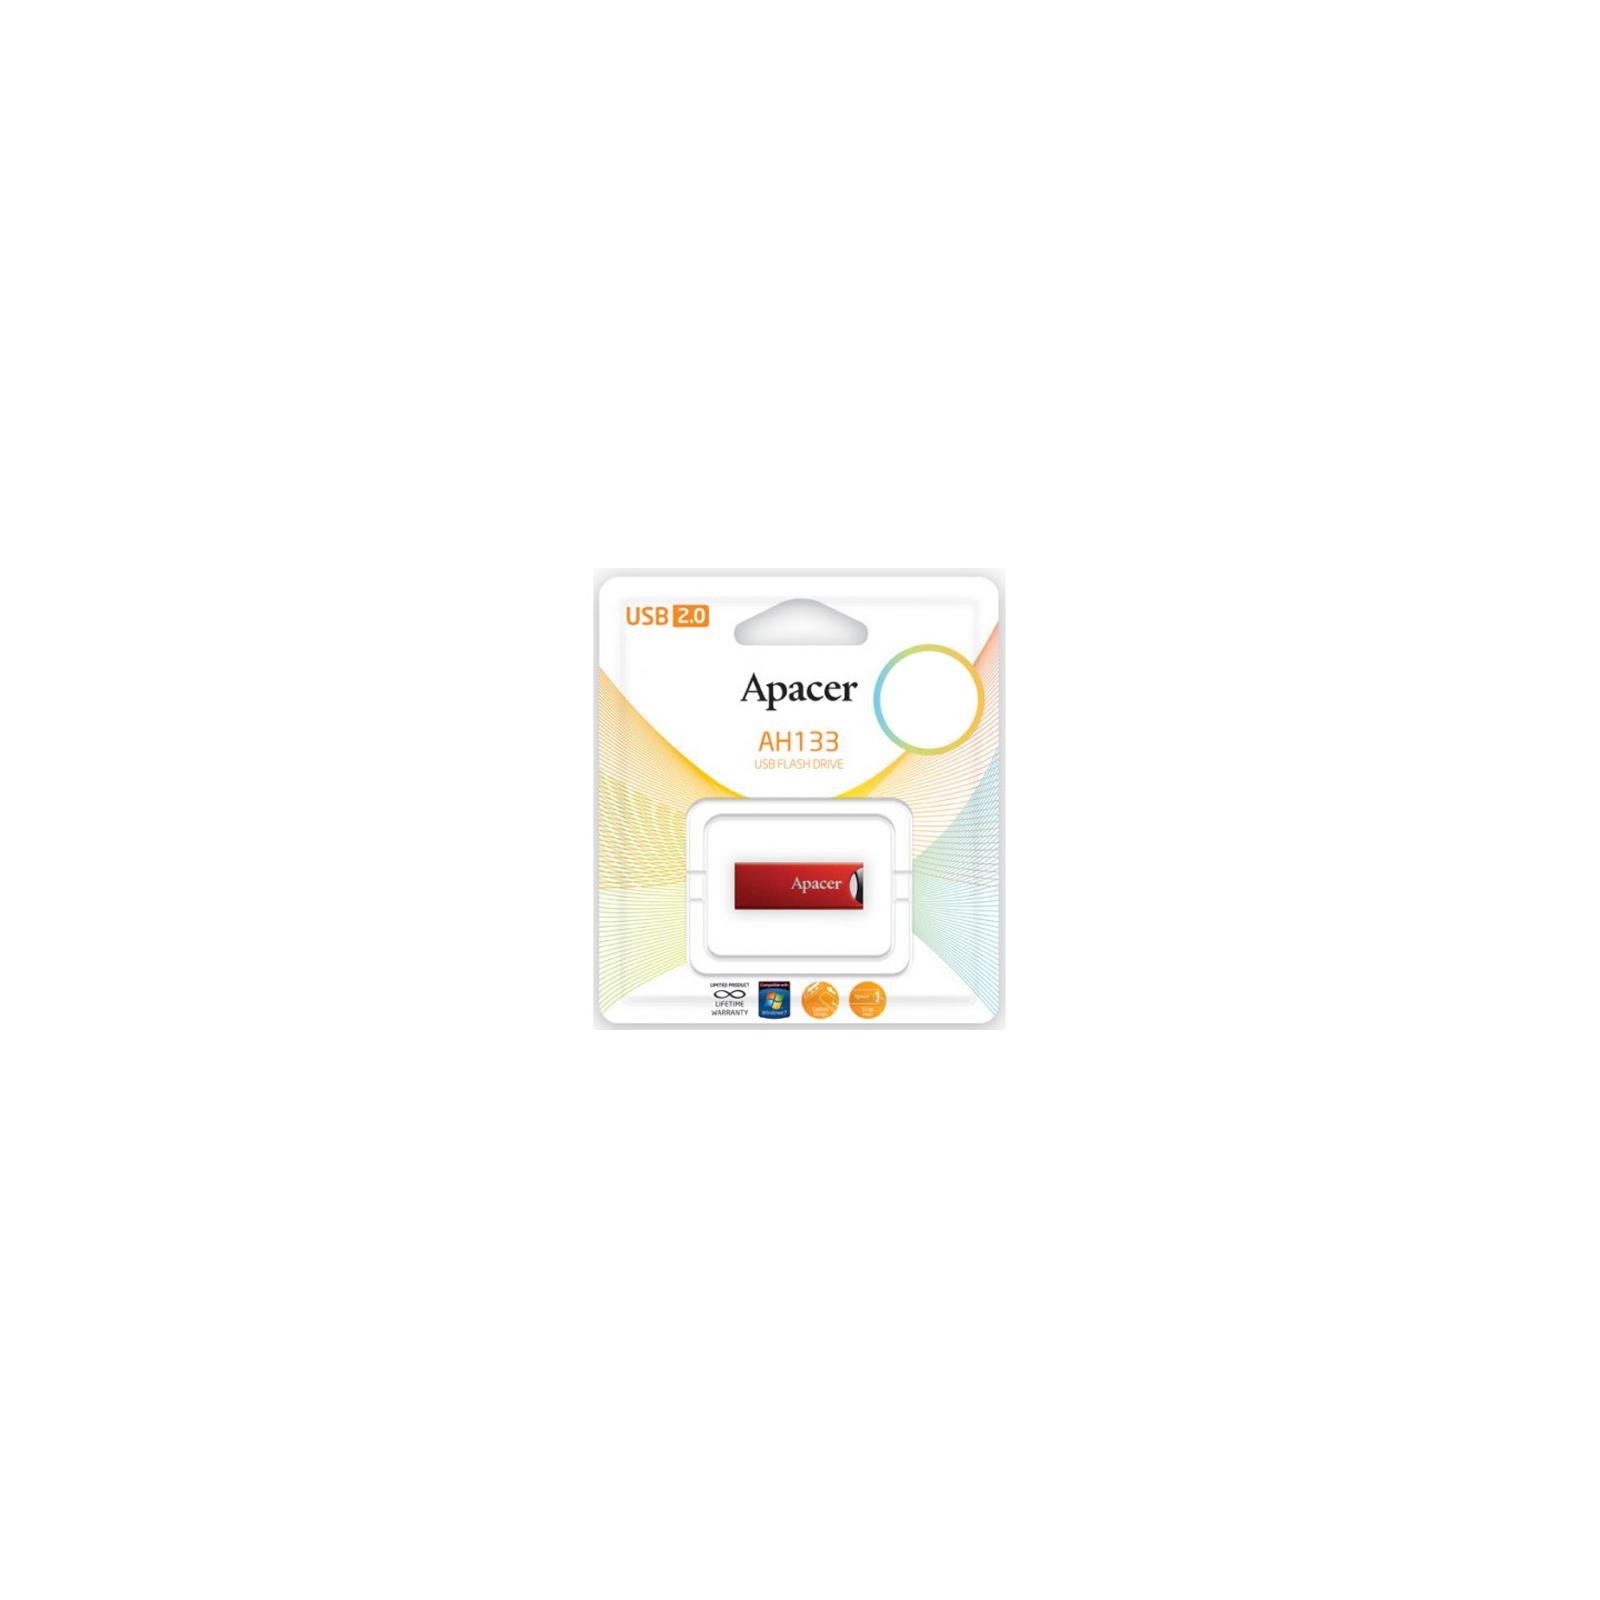 USB флеш накопитель 32GB AH133 Red RP USB2.0 Apacer (AP32GAH133R-1) изображение 4